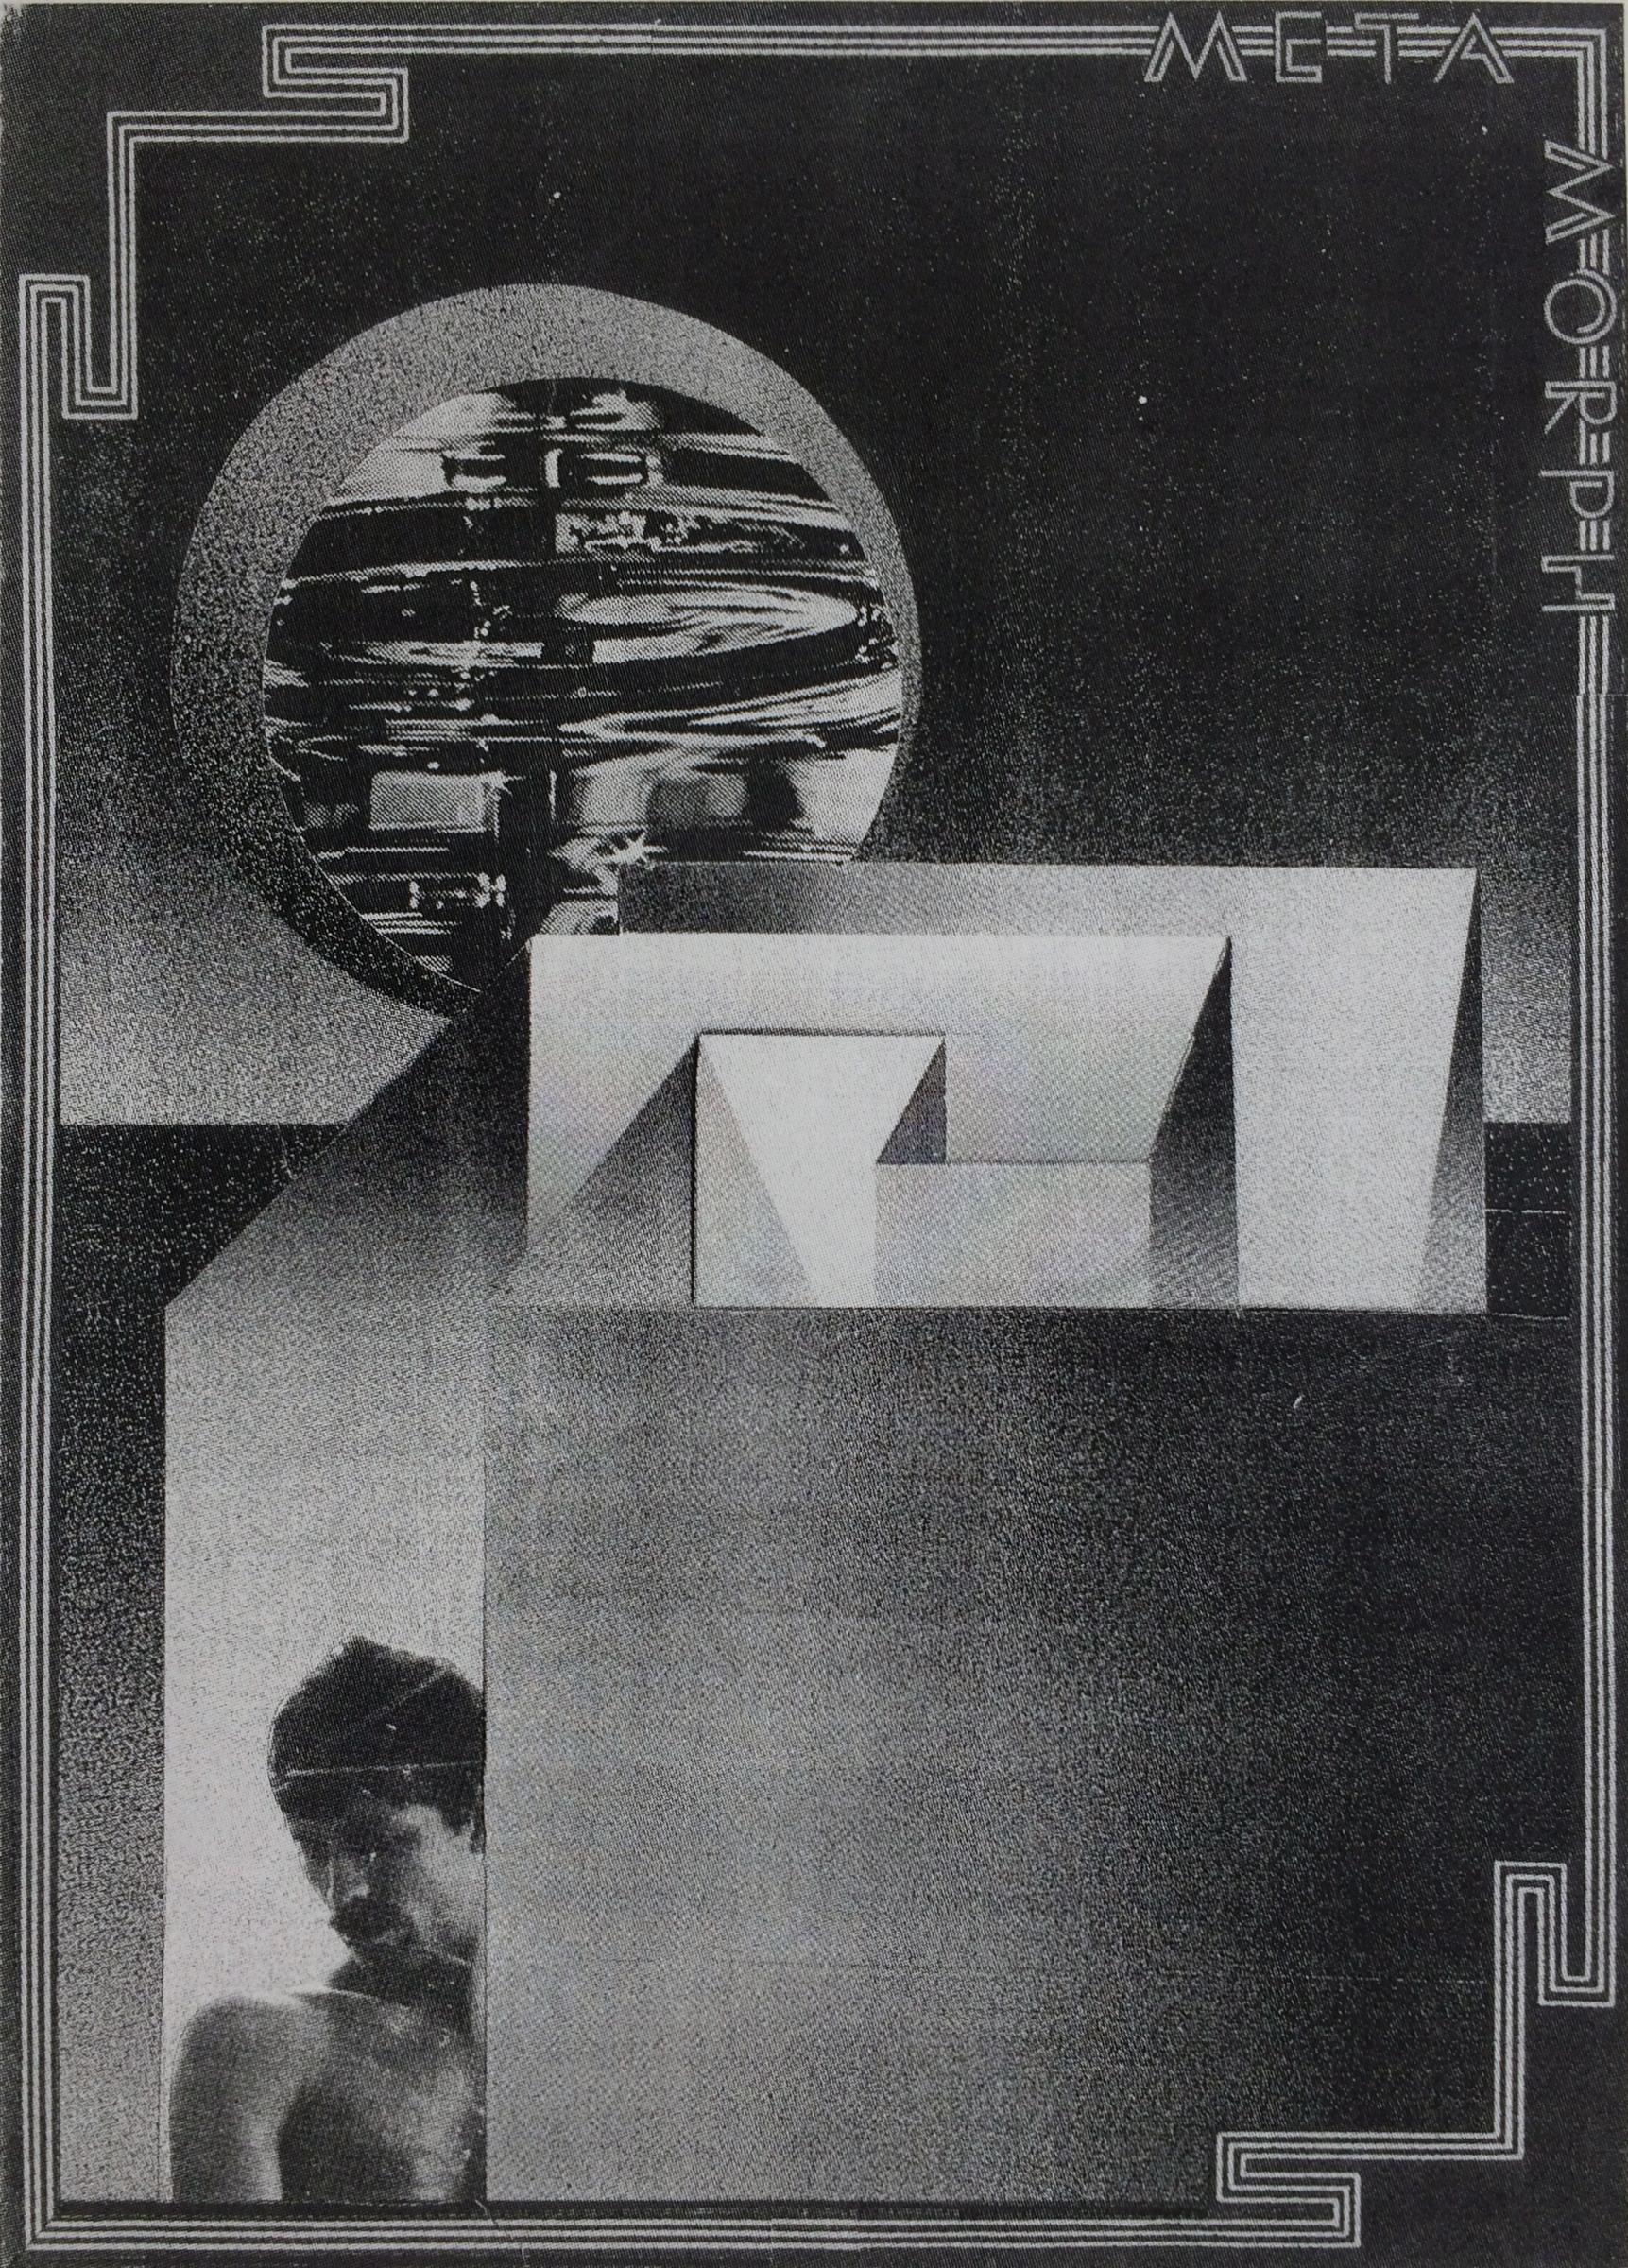 "GWENAËL RATTKE  Metamorph , 2014 unique silkscreen on paper, 27"" x 19"""